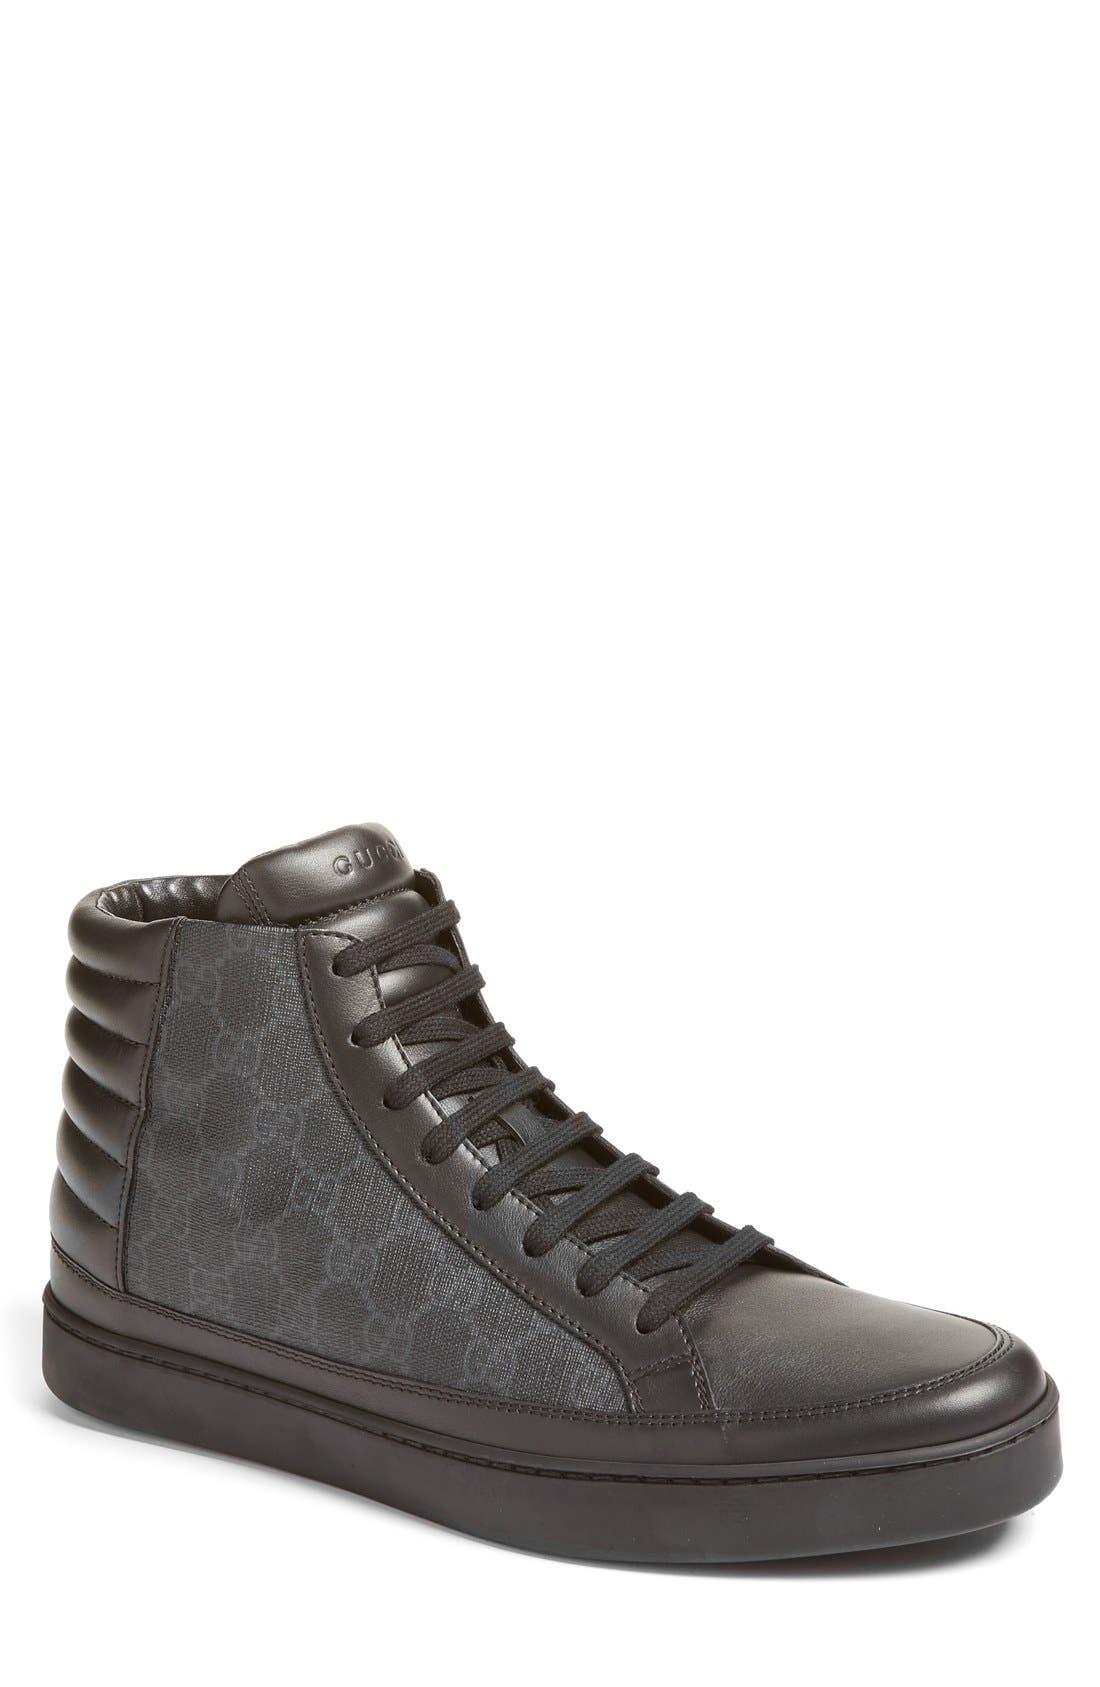 Gucci Shoes For Men Ebay